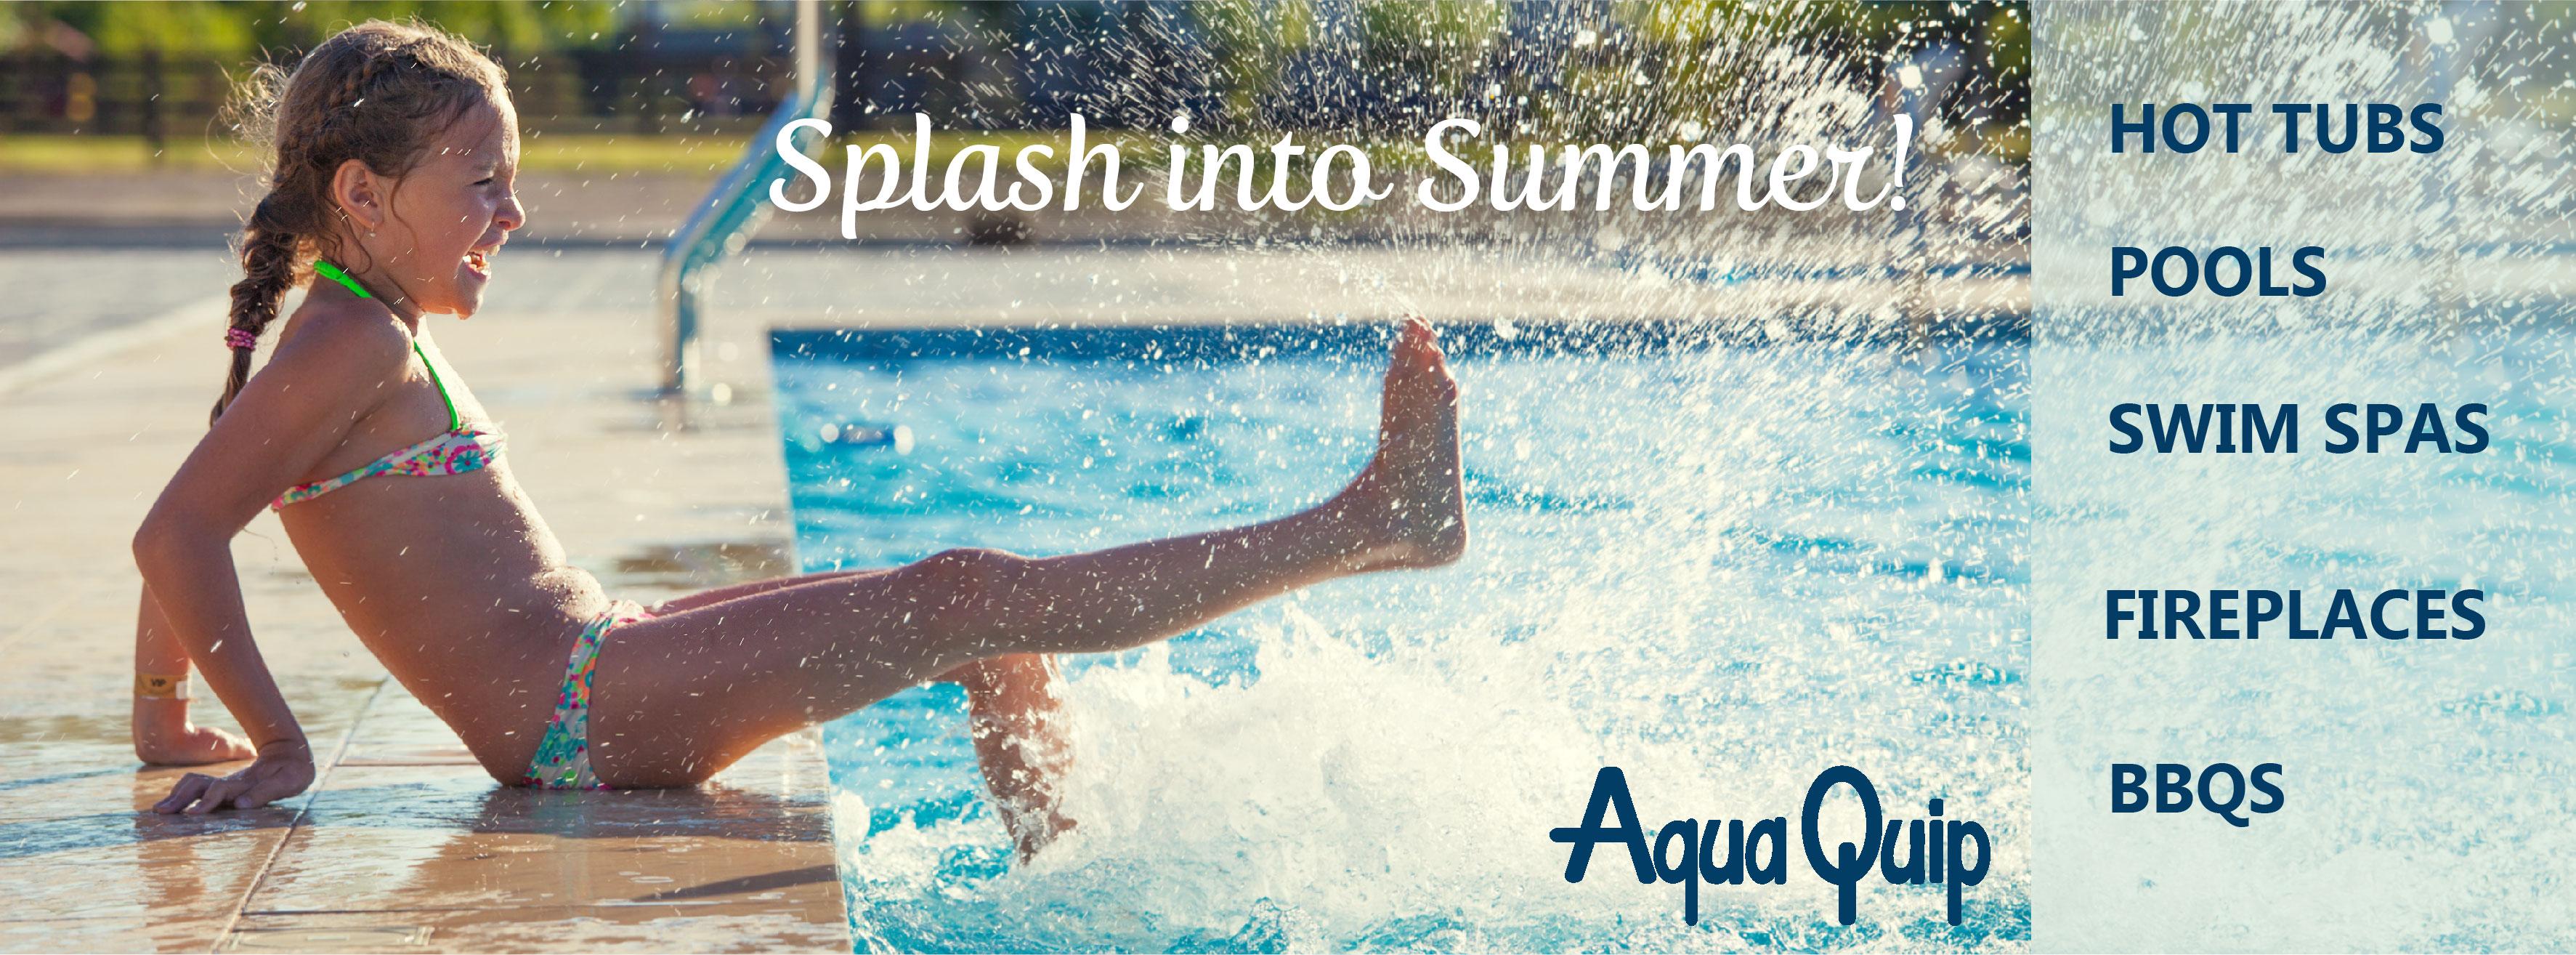 Aqua Quip reviews | Fireplace Services at 16350 Aurora Ave N - Shoreline WA